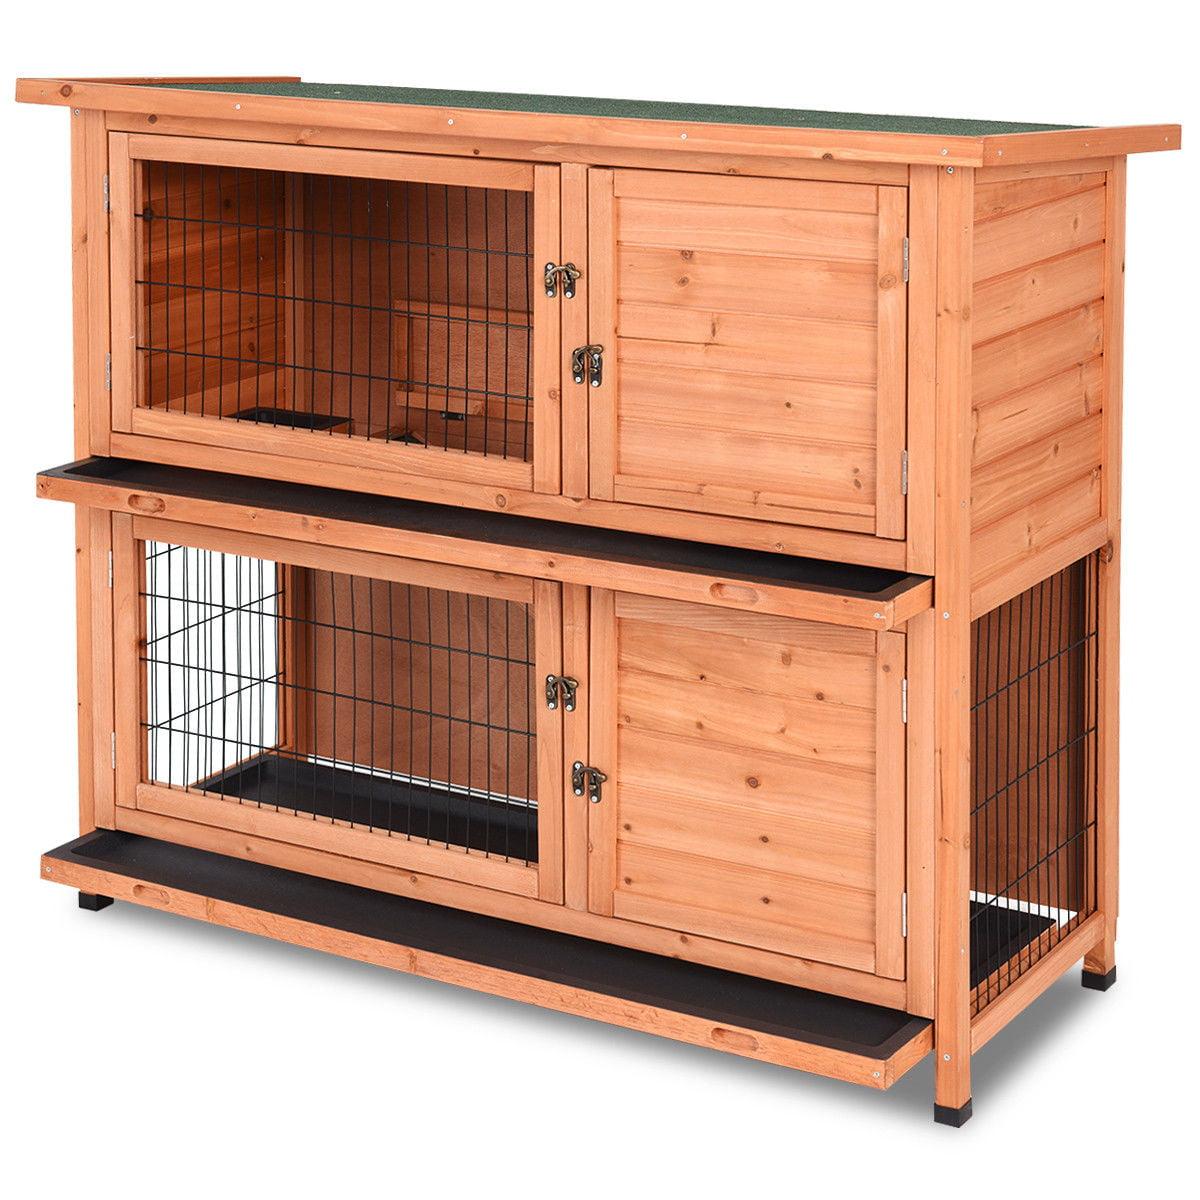 Gymax 48'' Wooden Rabbit Hutch